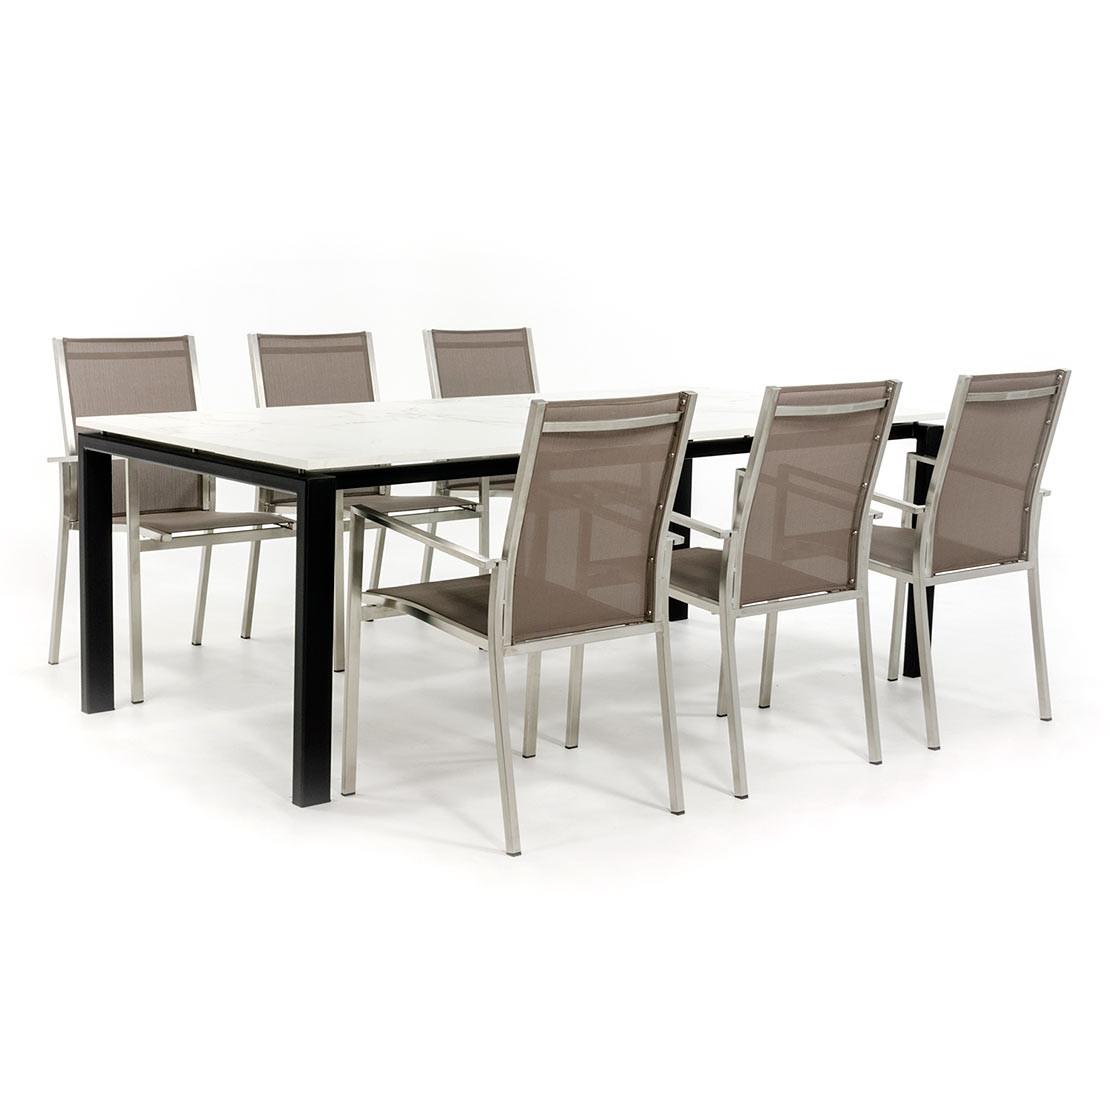 Dekton Entzo tuinset met RVS stoelen